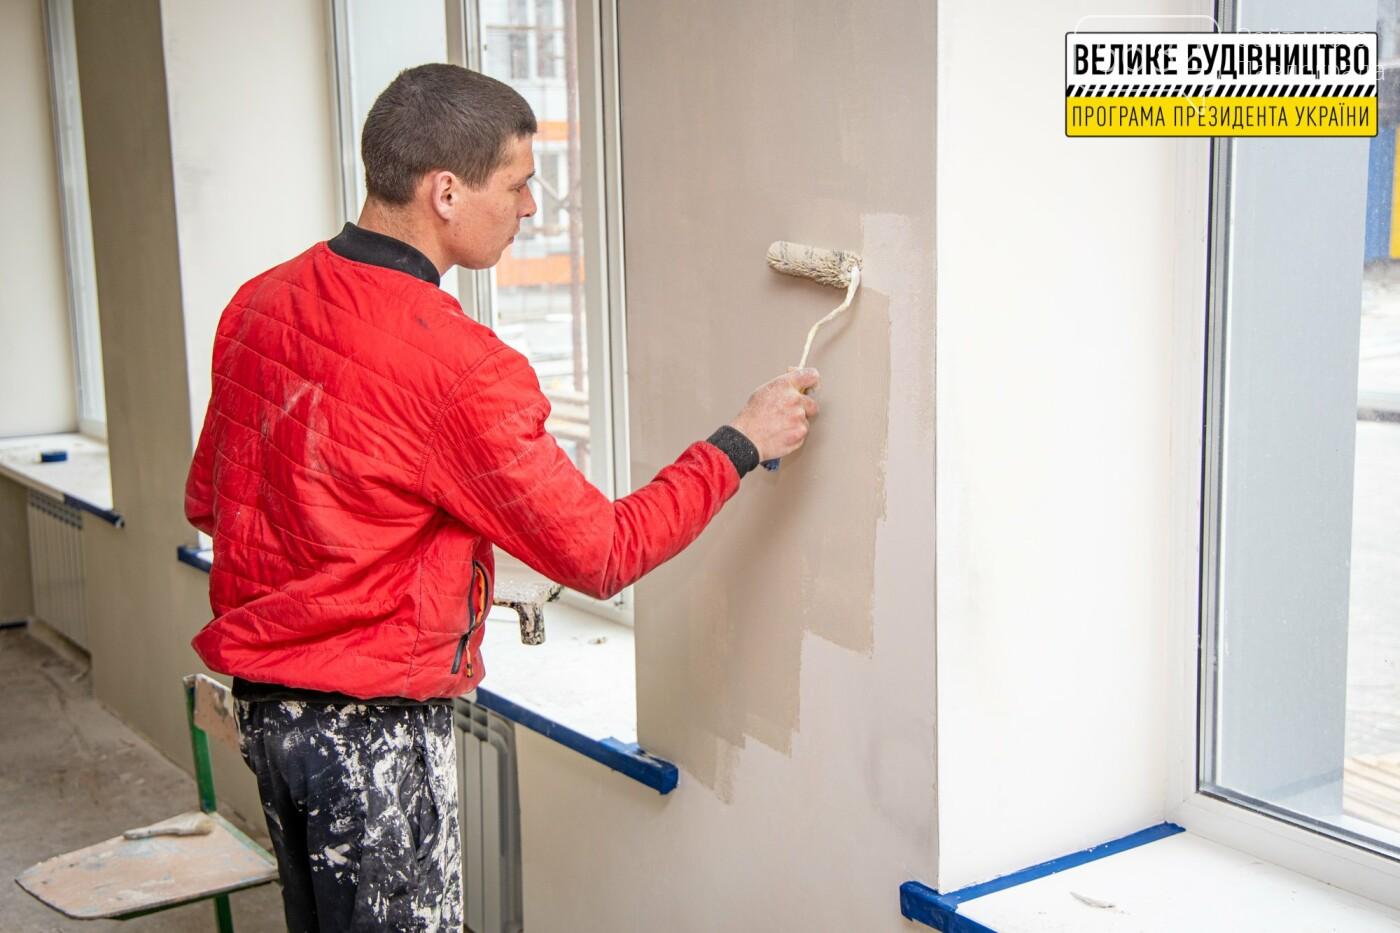 В Петропавловке модернизируют опорную школу (ФОТОРЕПОРТАЖ), фото-8